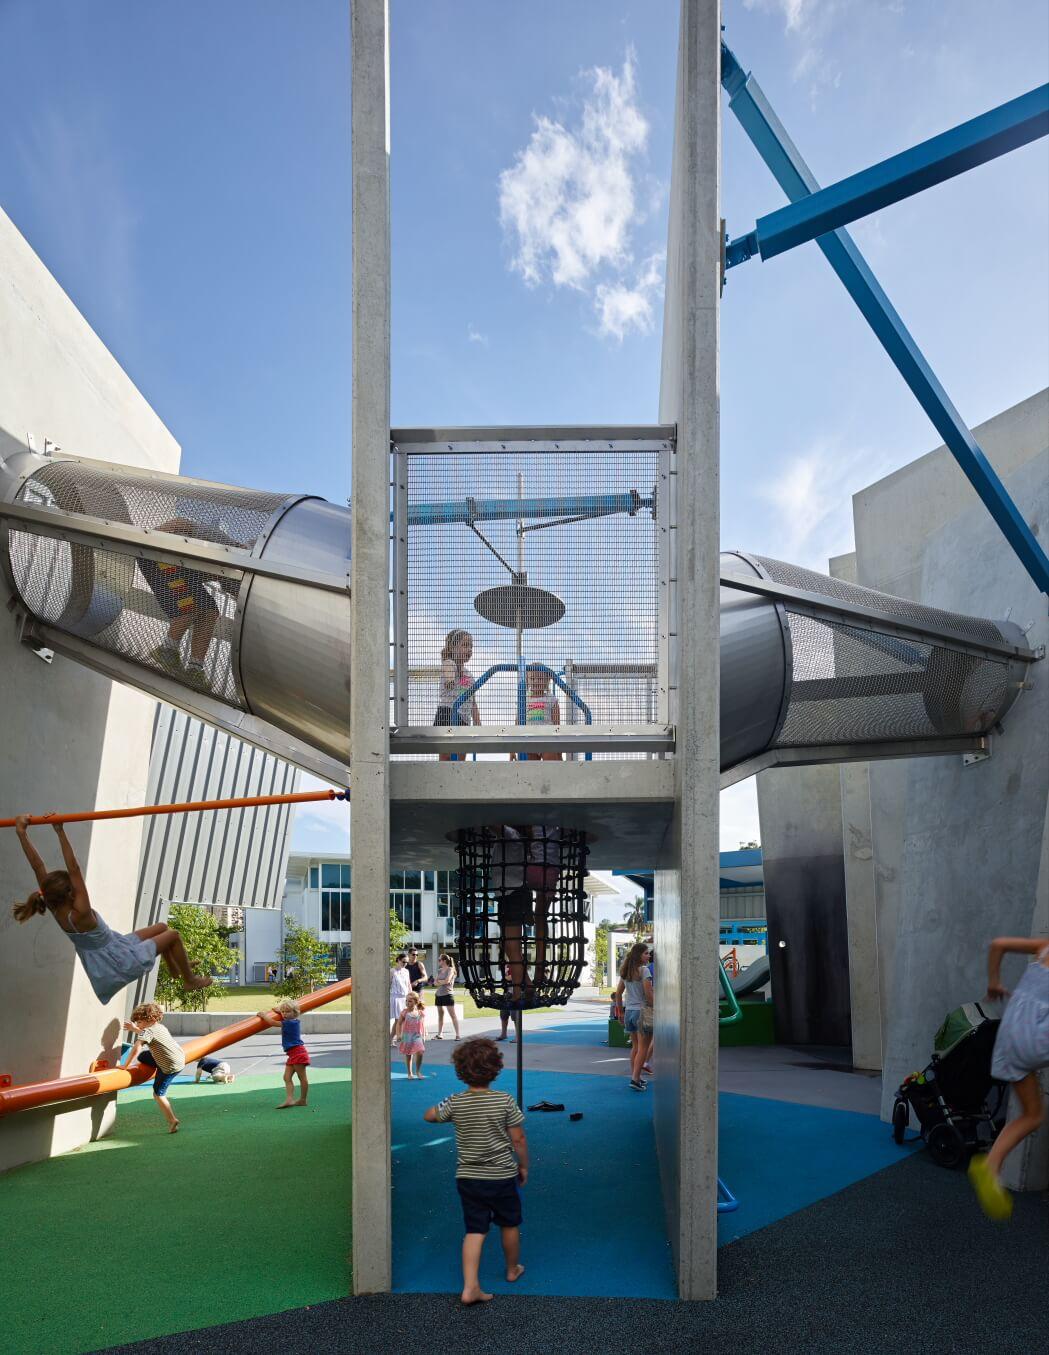 Frew-park-arena-playground-guymer-bailey-10.JPG